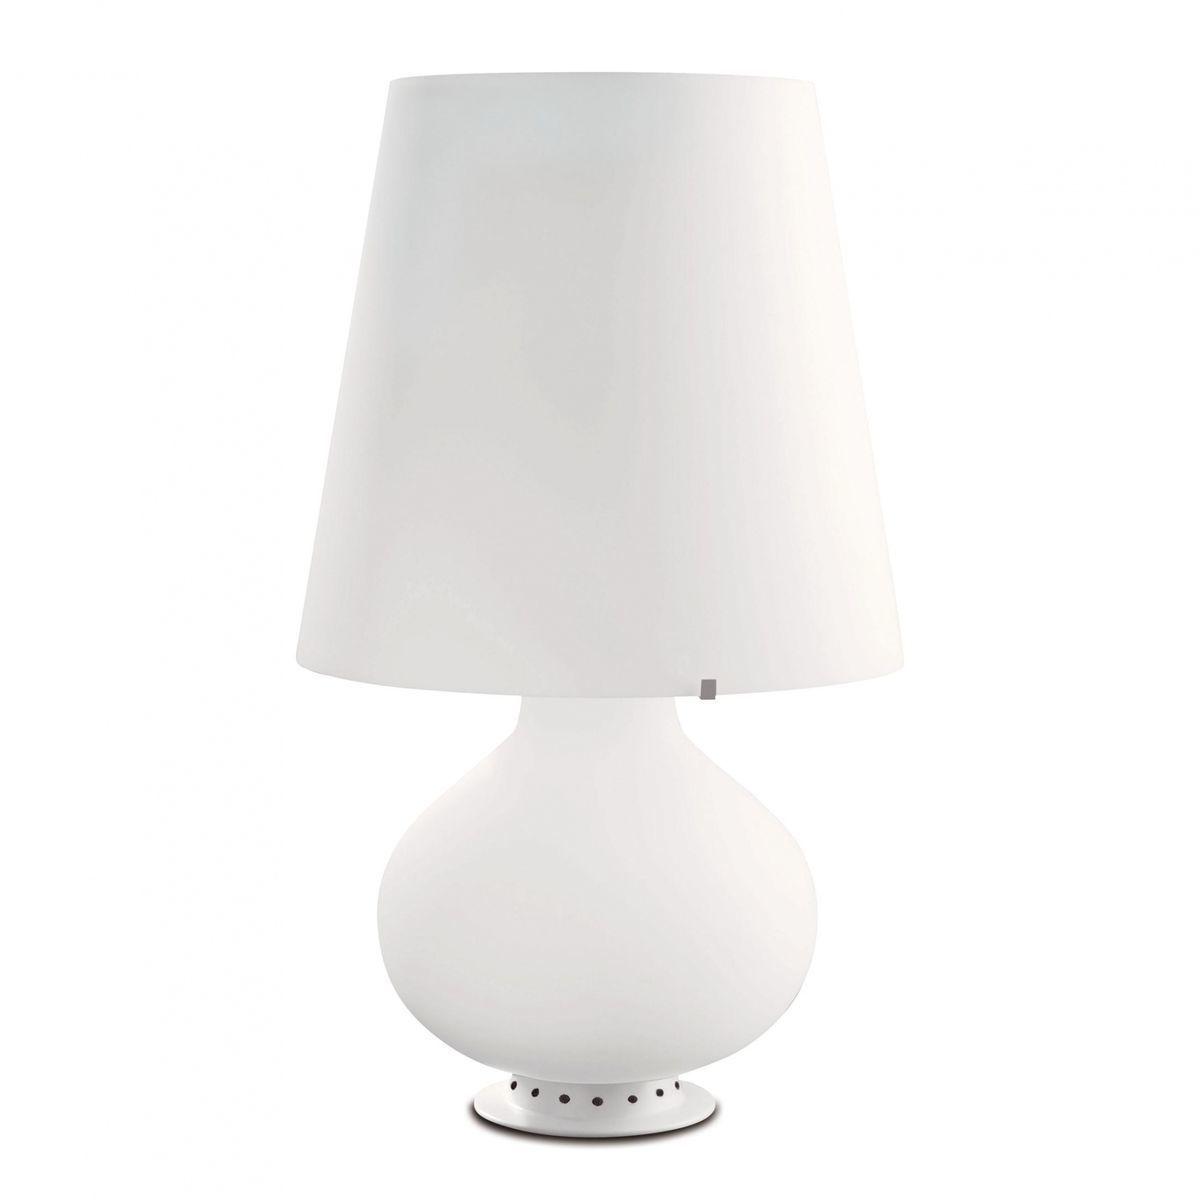 Fontana 1853 Grande Table Lamp | Fontana Arte | AmbienteDirect.com